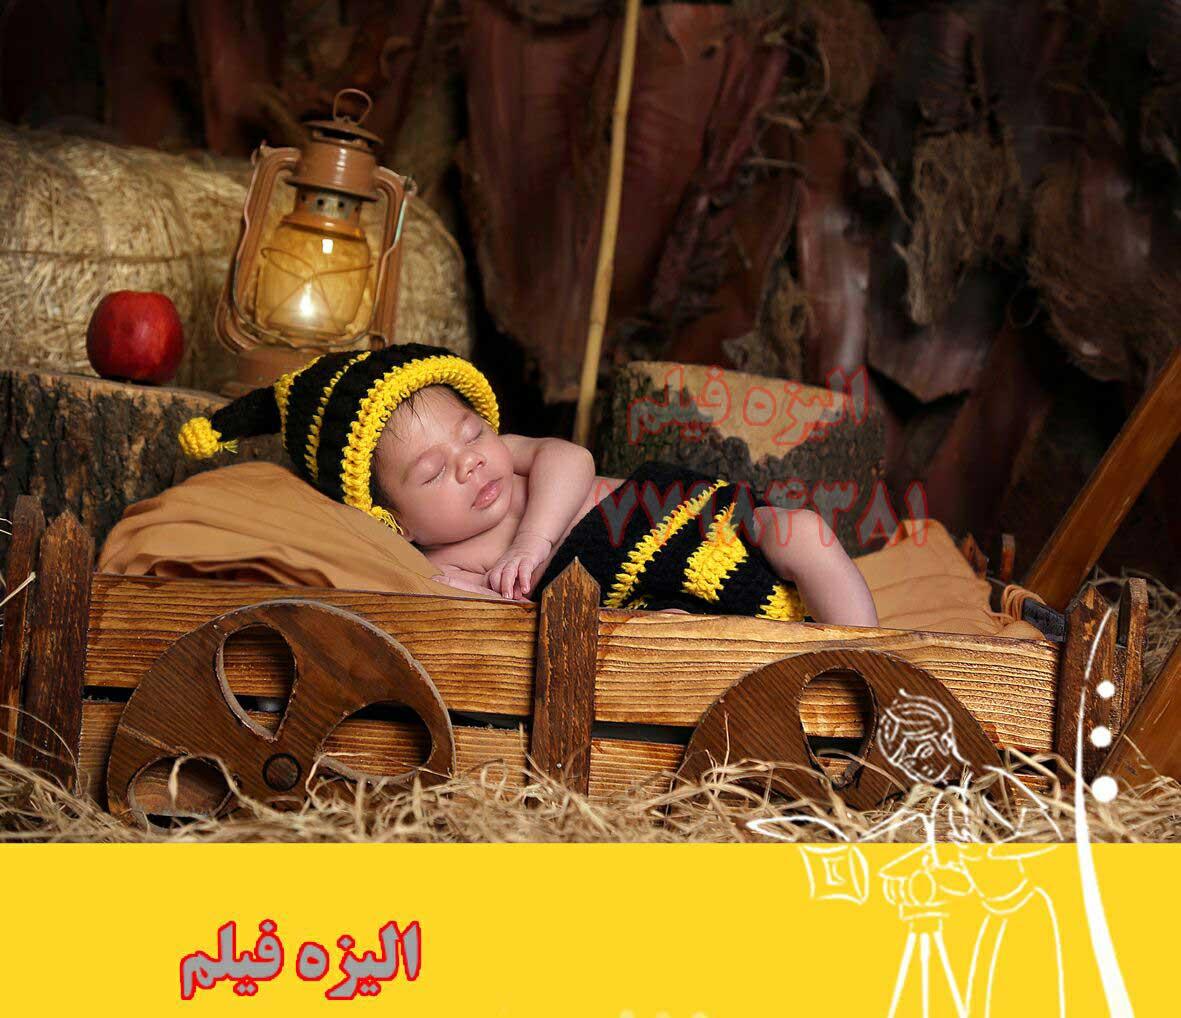 عکاسی کودک و نوزاد توسط سهراب نعیمی مدرس عکاسی عکاسی نوزاد آتلیه کودک آتلیه نوزاد استودیو کودک کلیپ کودک